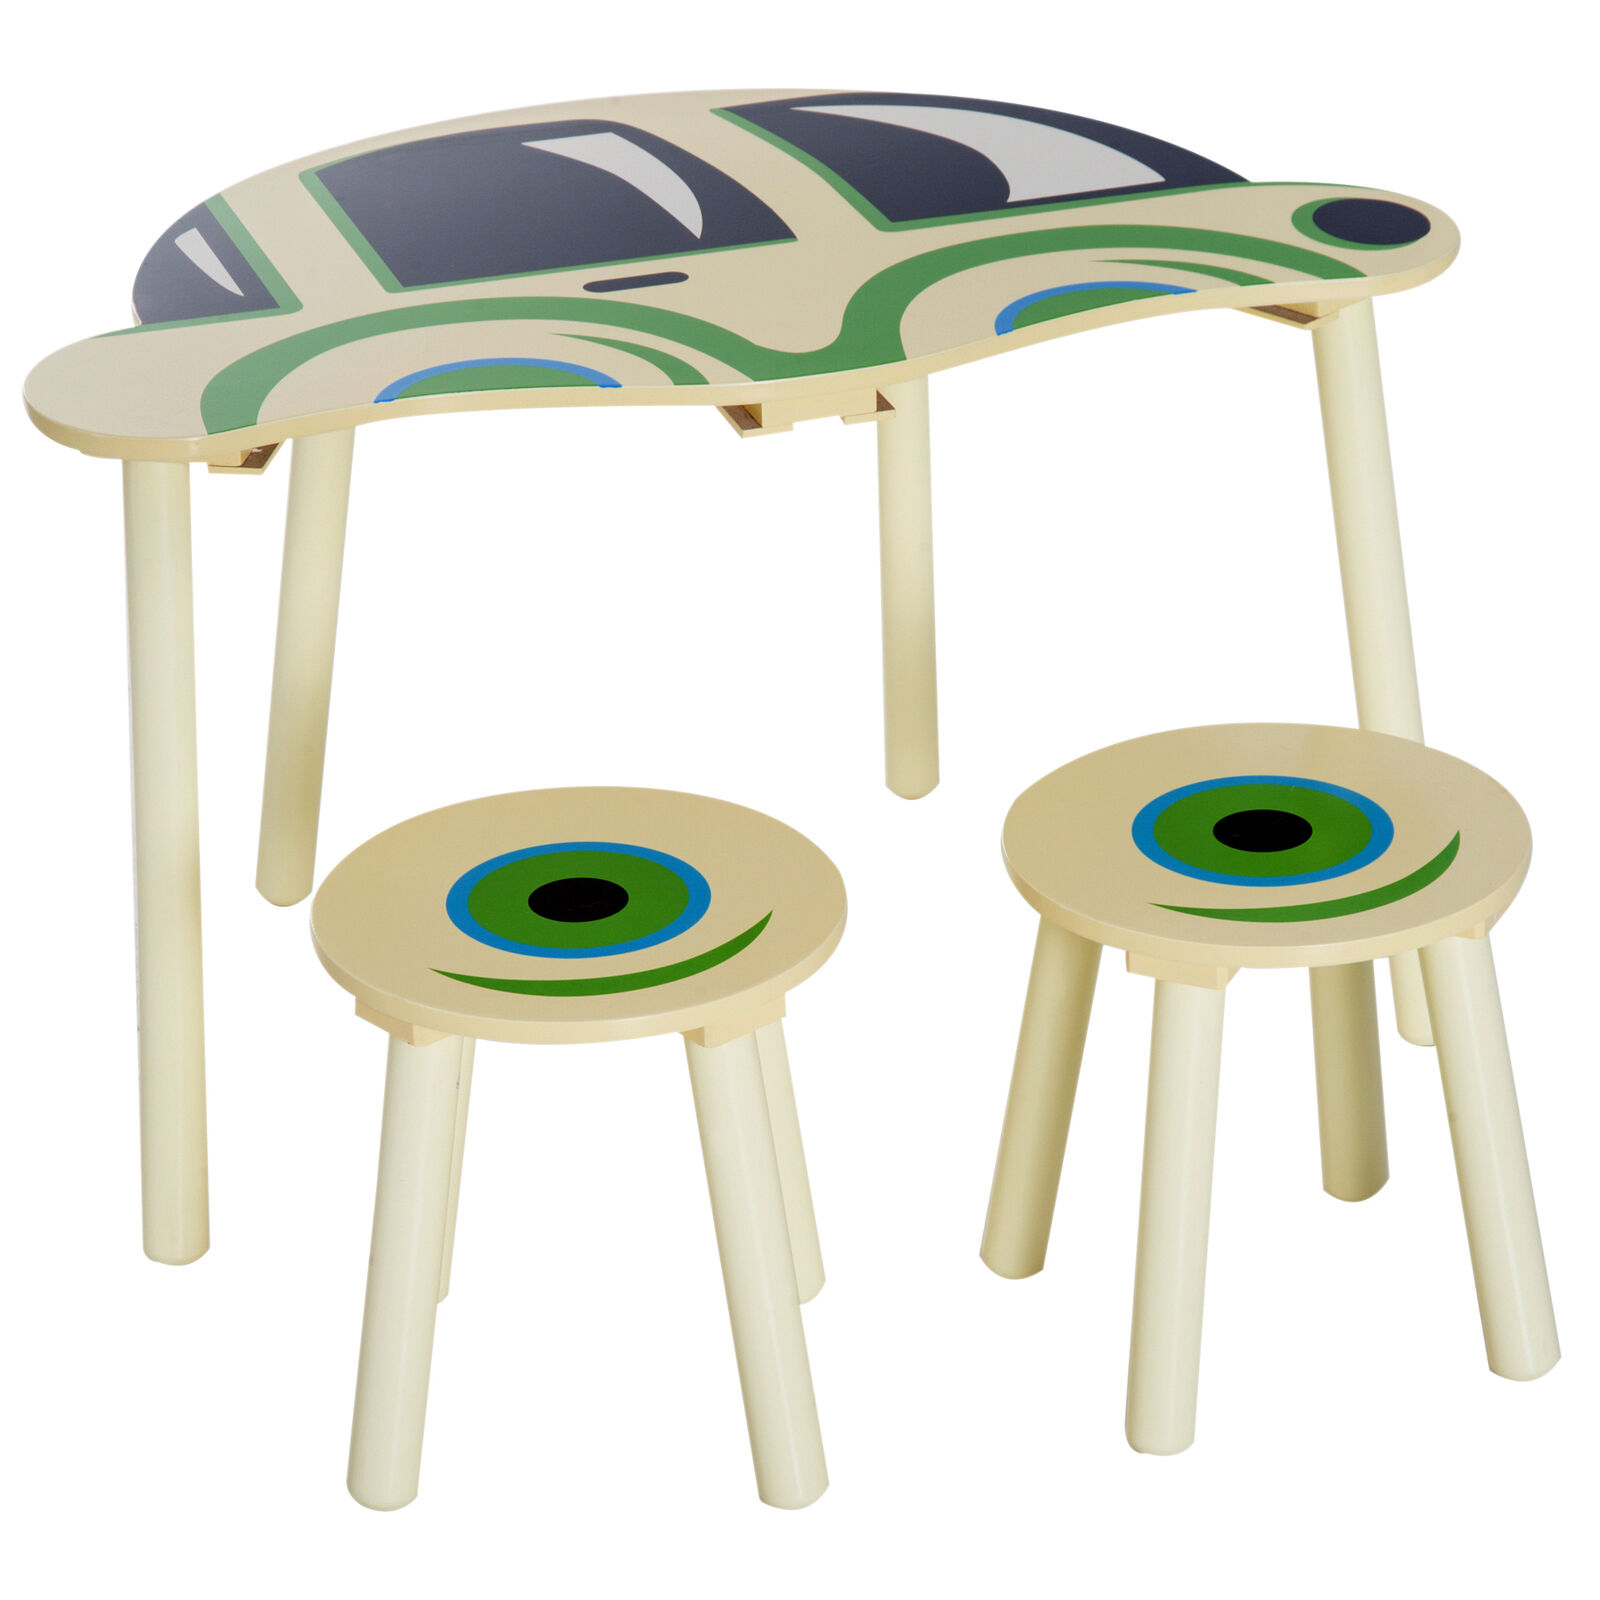 HOMCOM Ensemble Table et Tabourets Enfants Design Voiture Beige Vert MDF Bois de